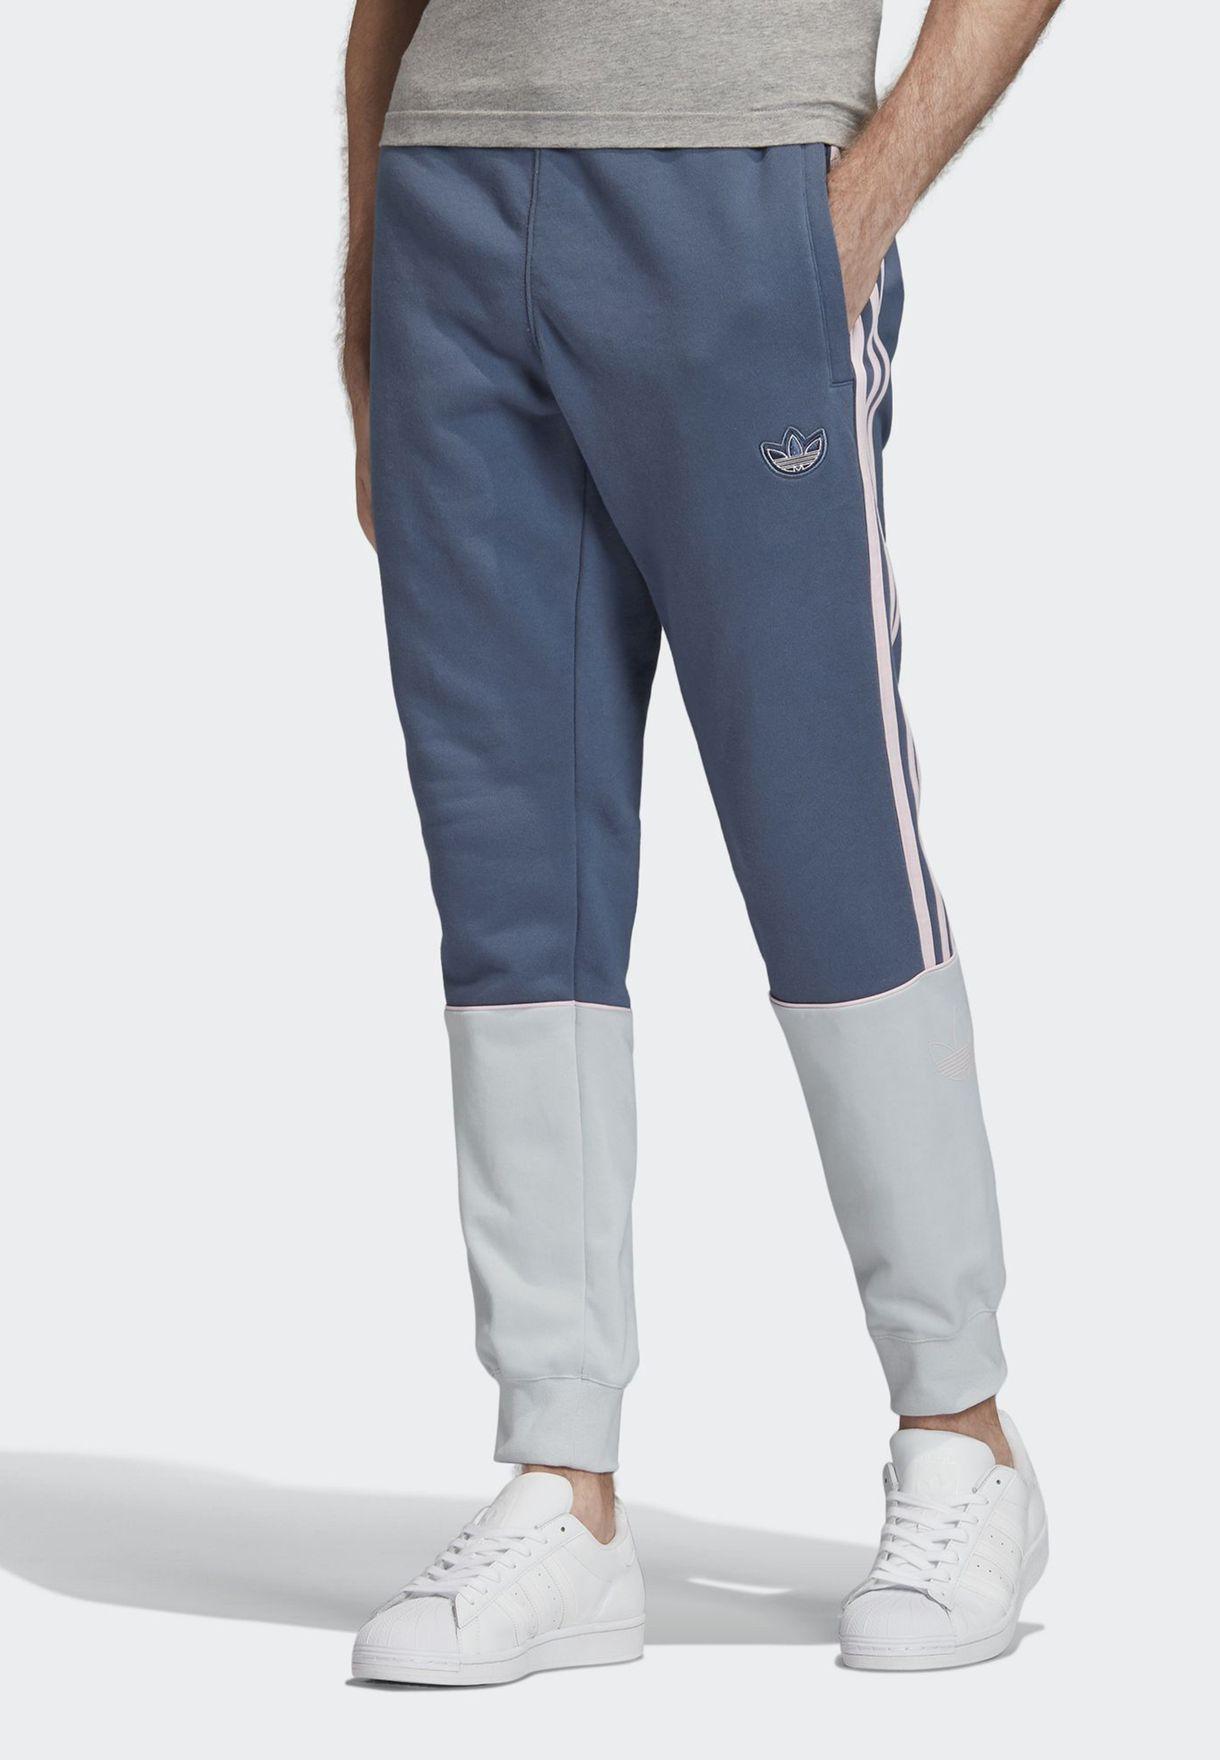 Outline Sweatpants